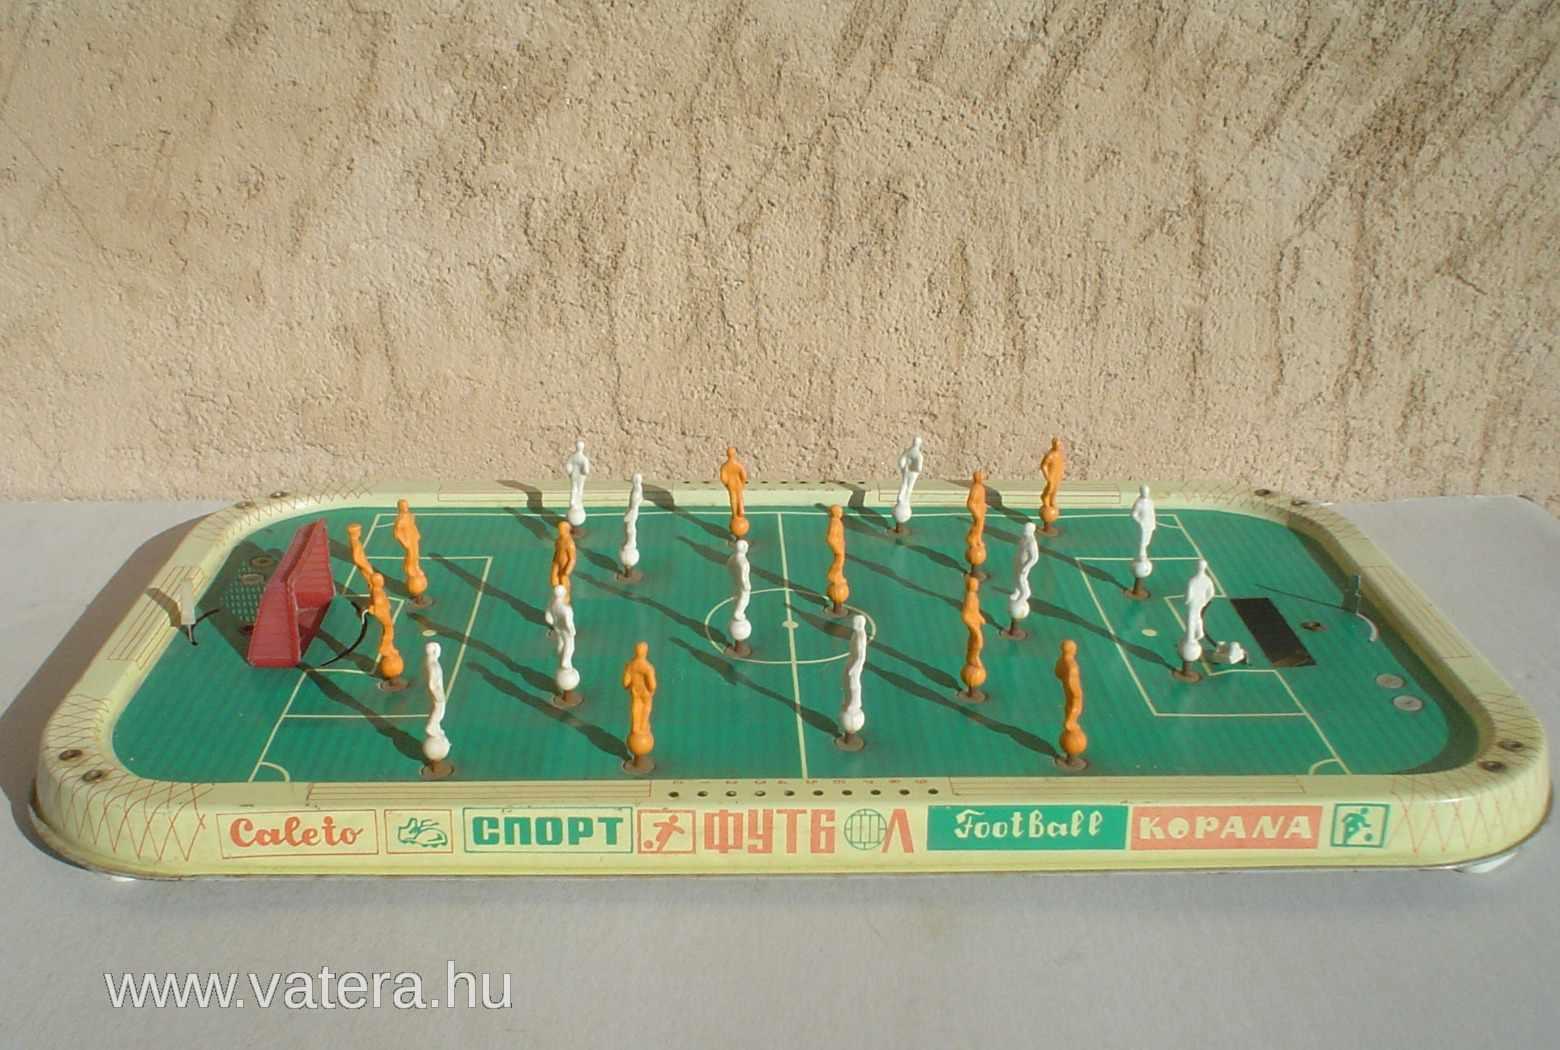 regi-lemezjatek-rugos-foci-szovjet-orosz-045b_1_big.jpg